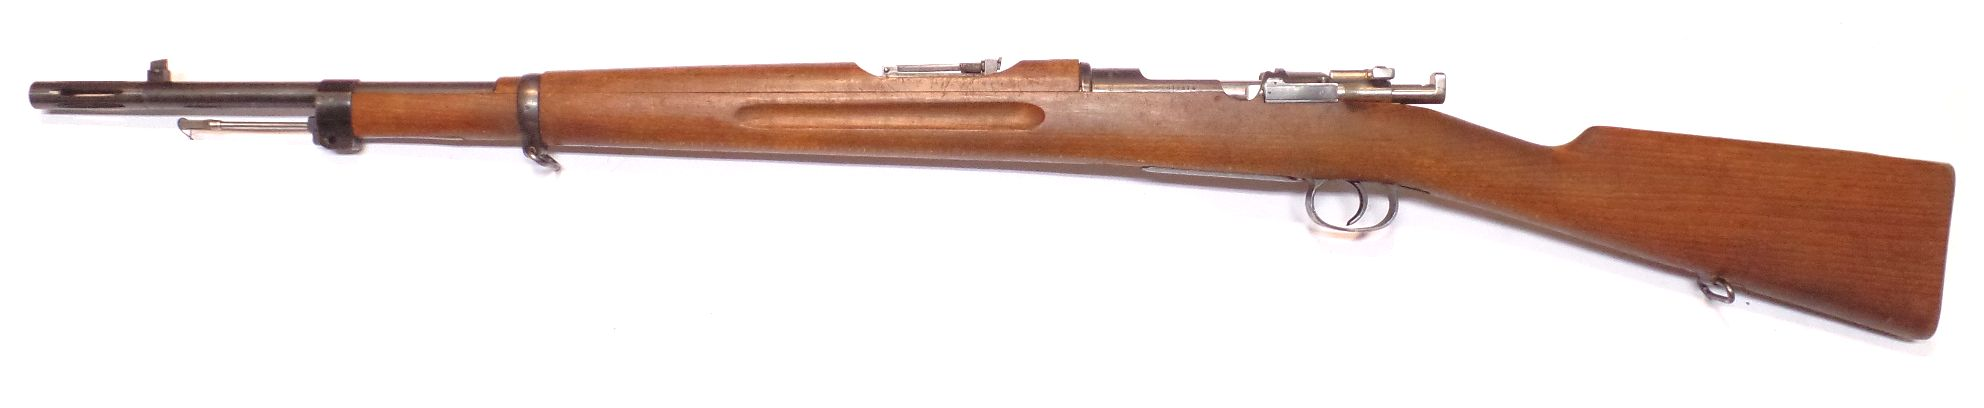 CARL GUSTAV M96-38 calibre 6.5x55